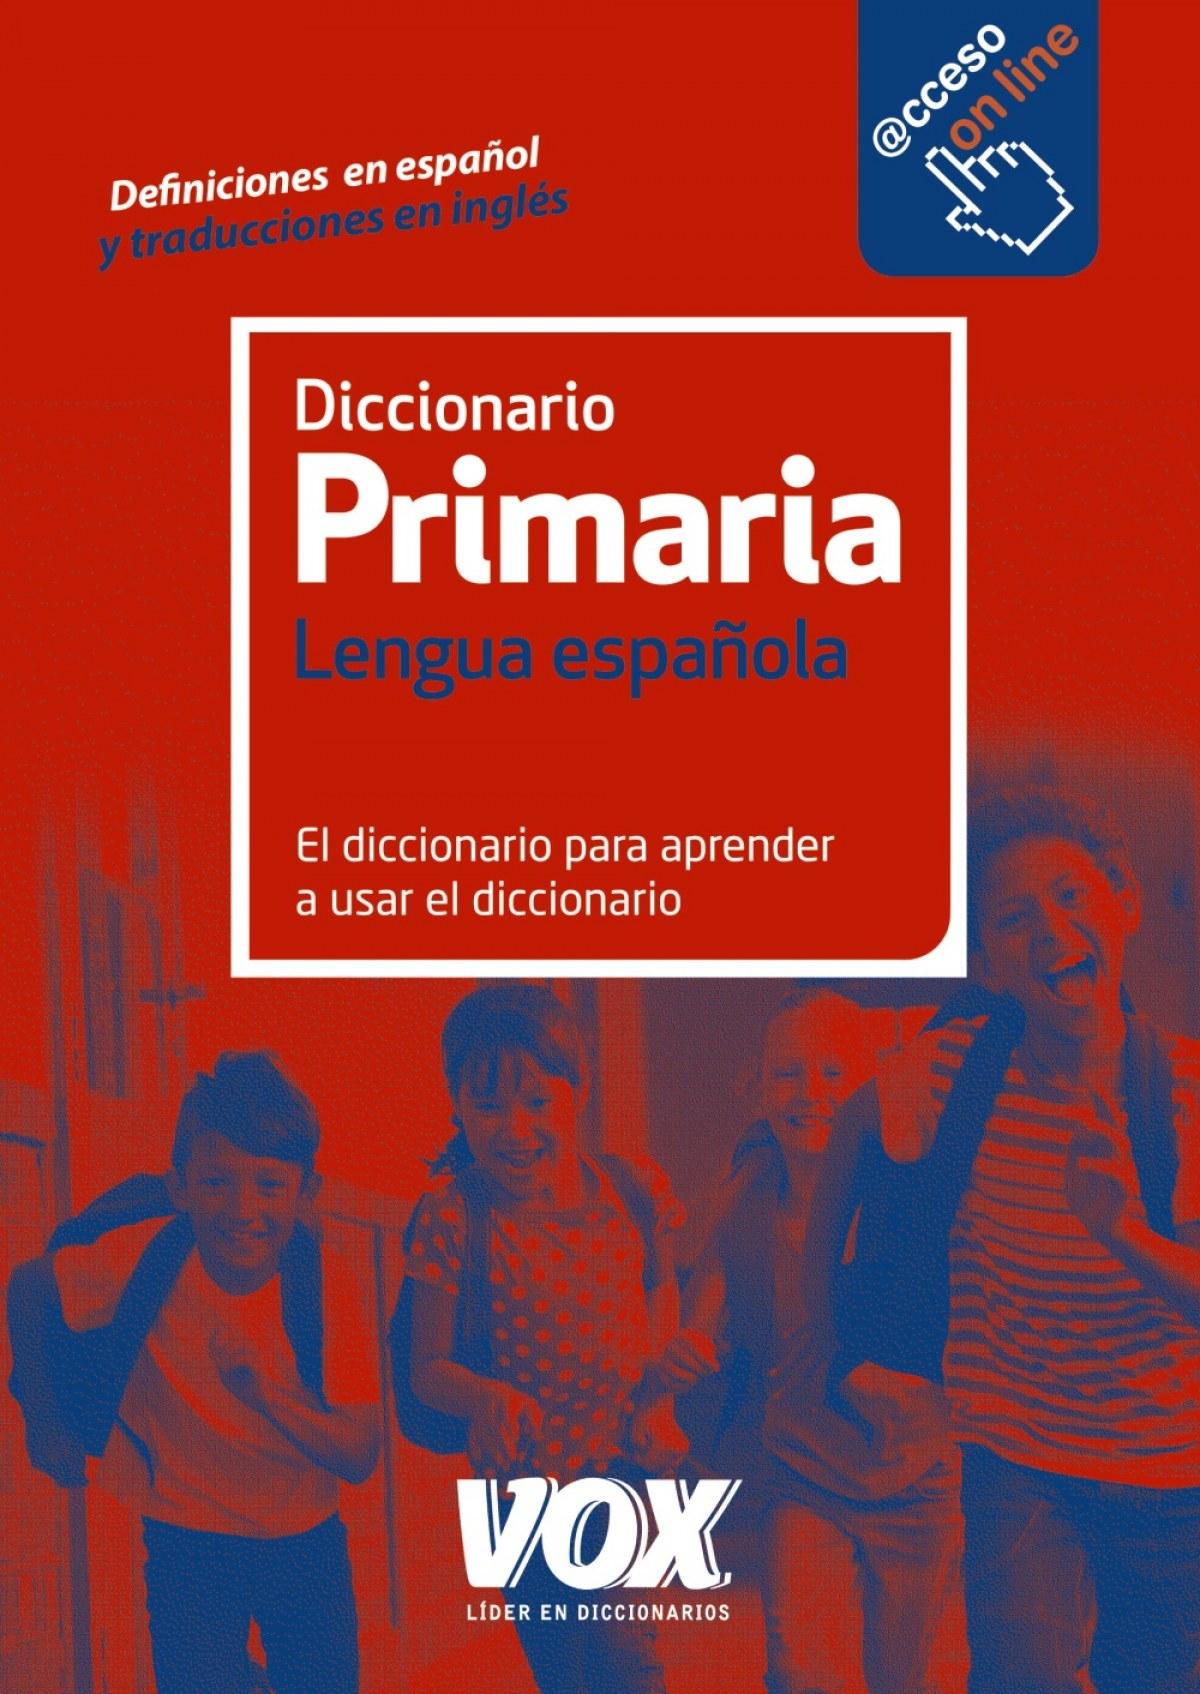 VOX DICCIONARIO PRIMARIA LENGUA ESPAÑOLA